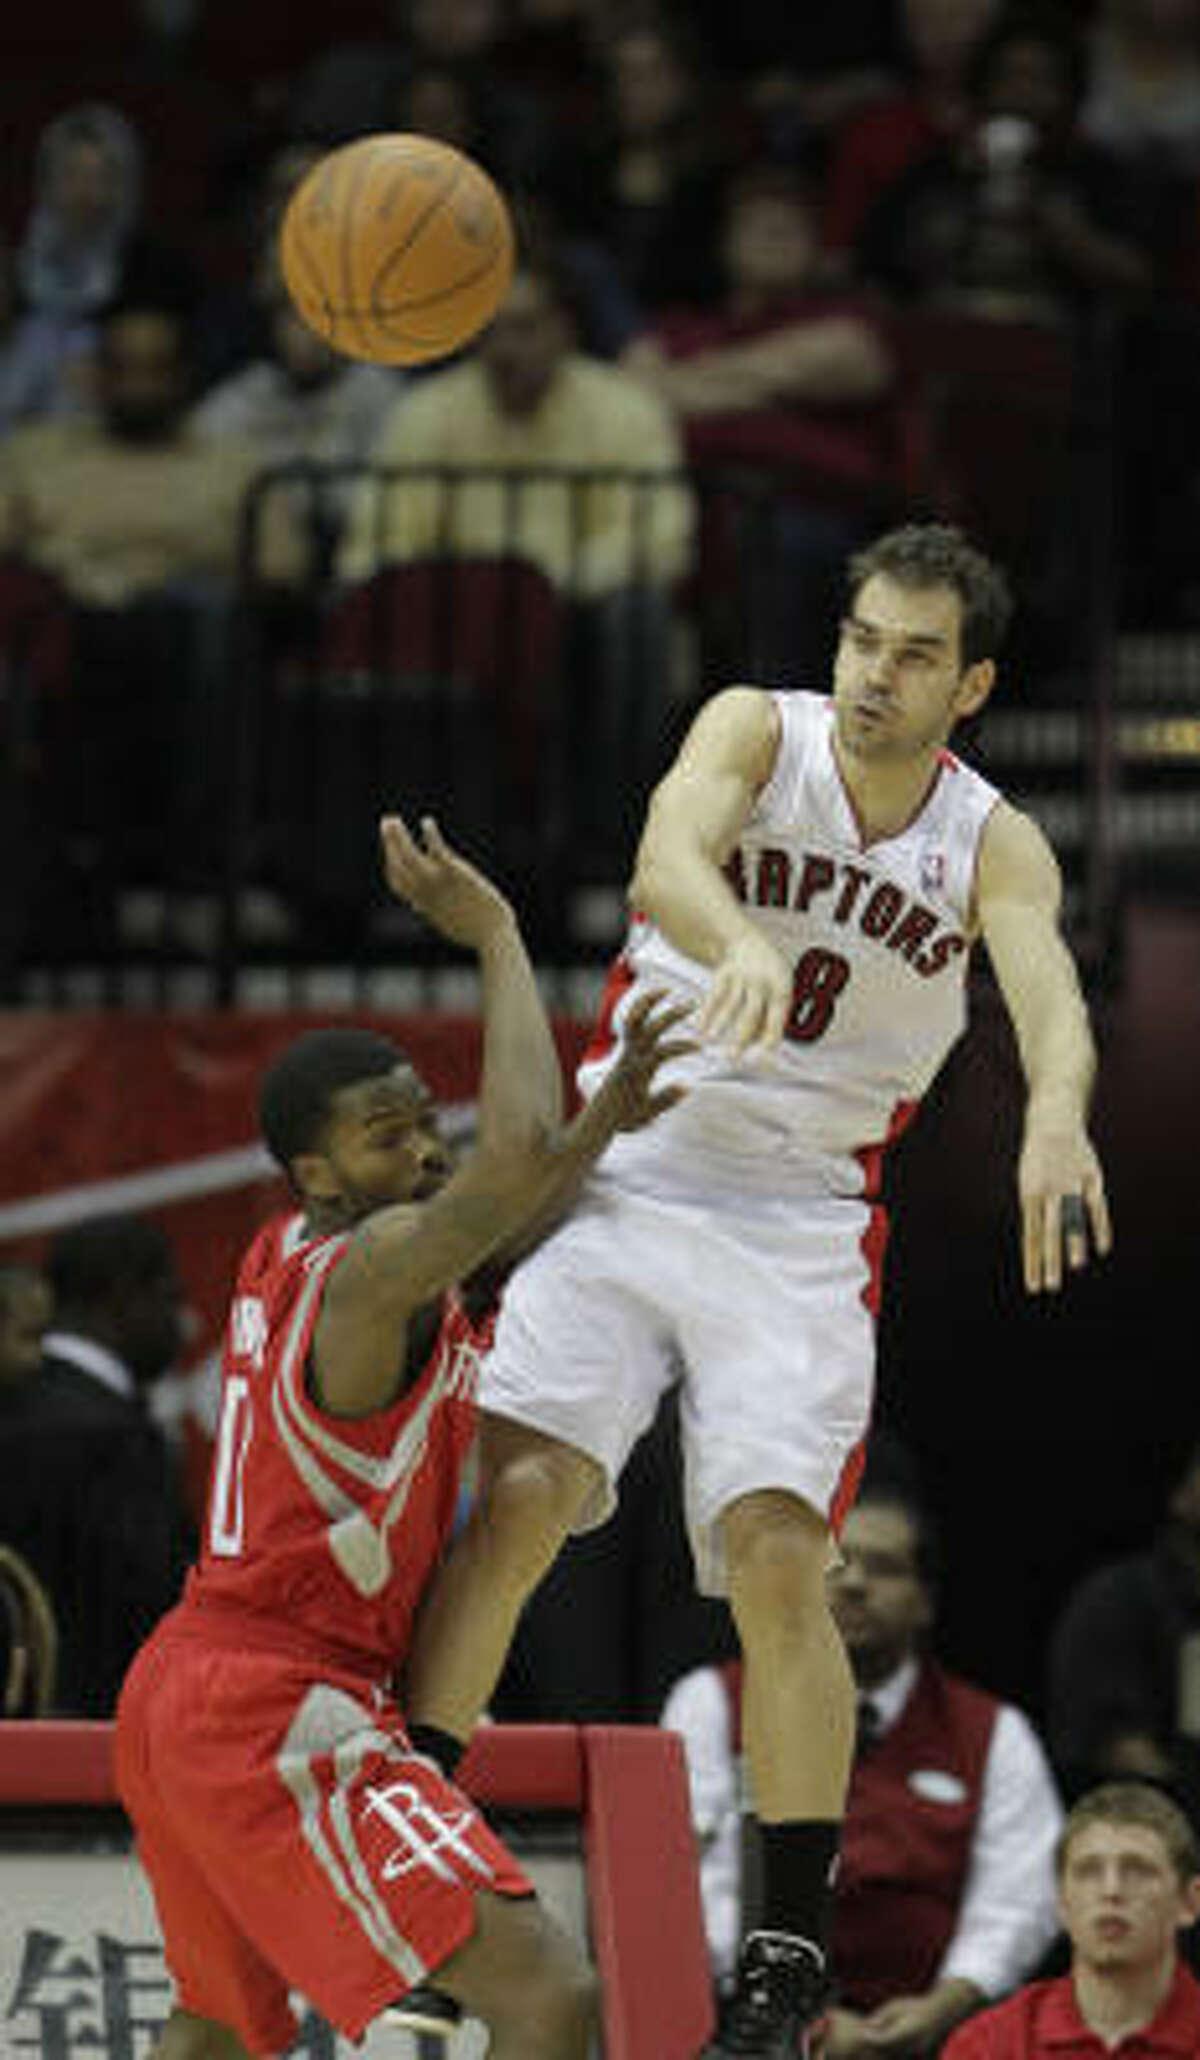 Toronto's Jose Calderon (8) passes the ball over Rockets guard Aaron Brooks.